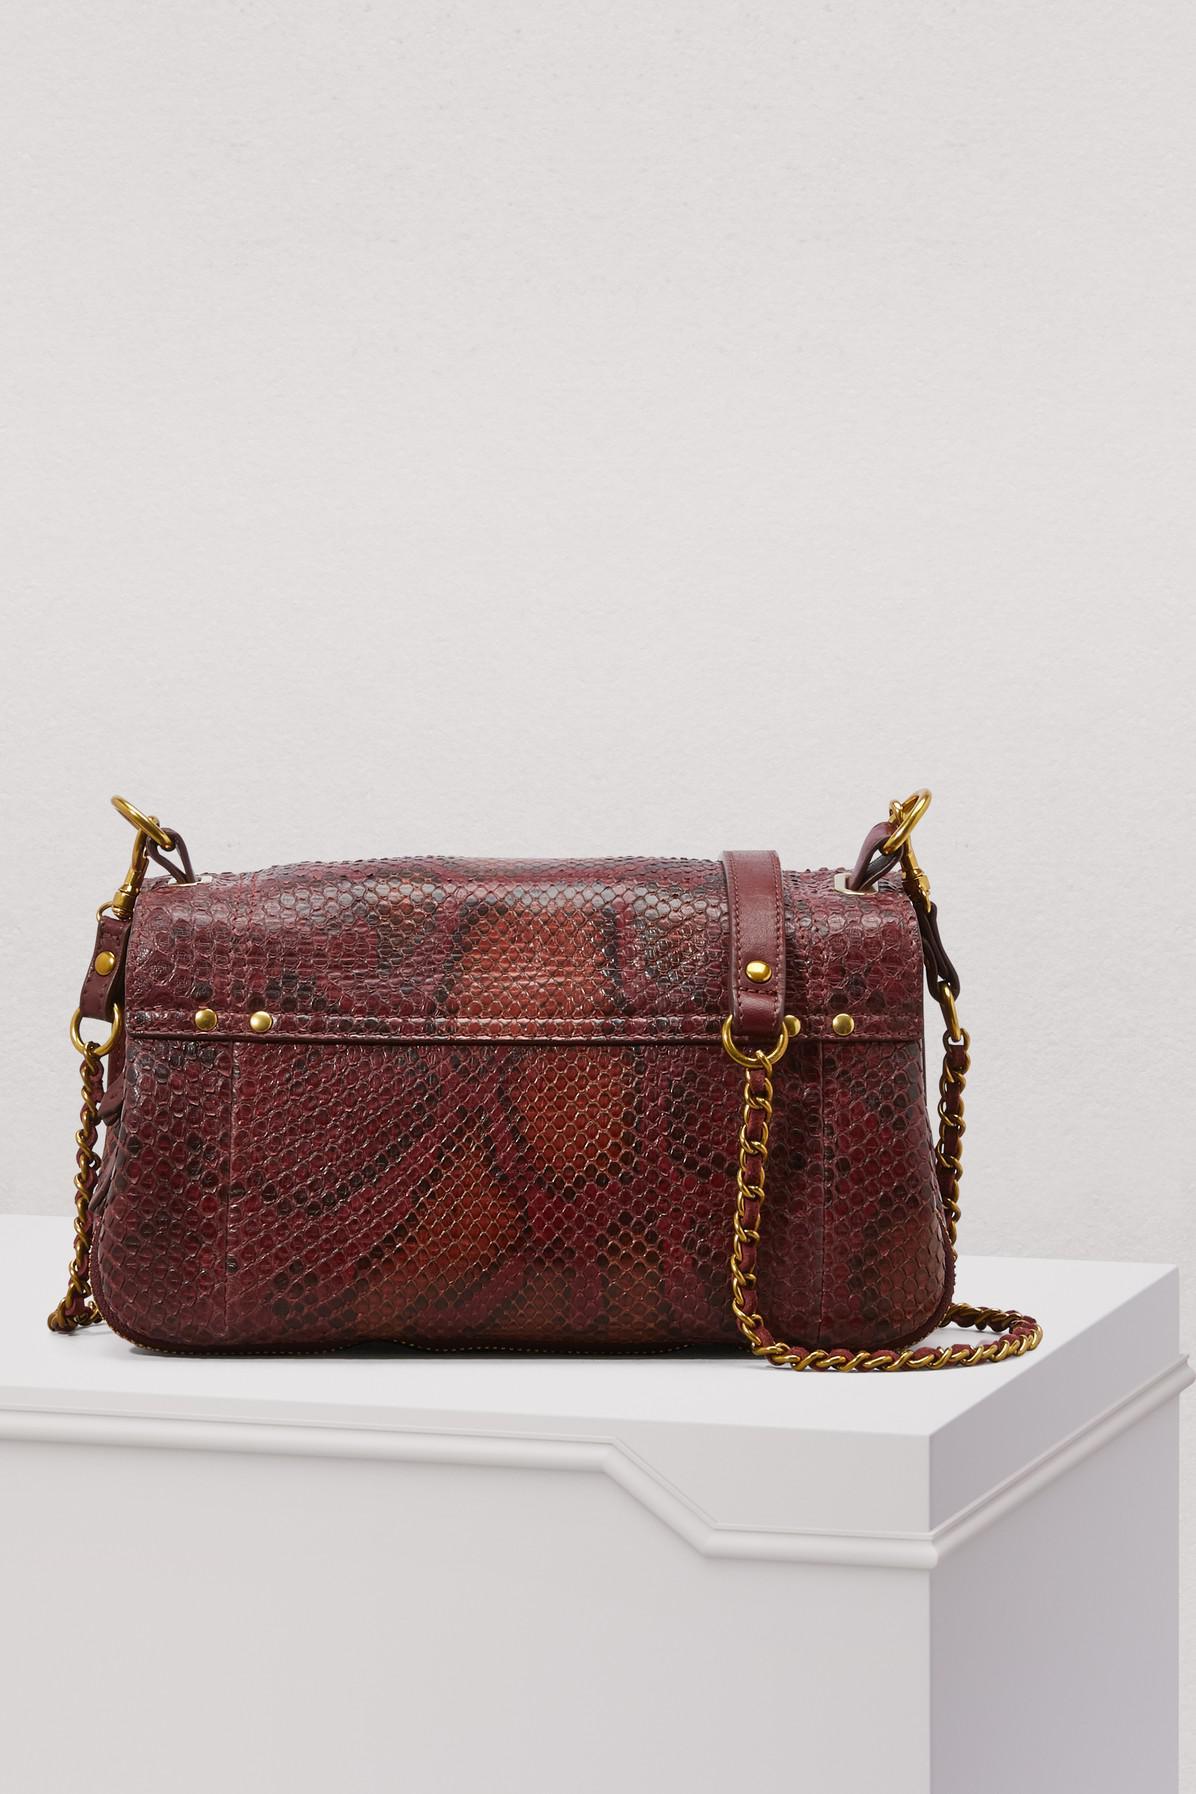 Jérôme Dreyfuss Leather Bobi Python Crossbody Bag